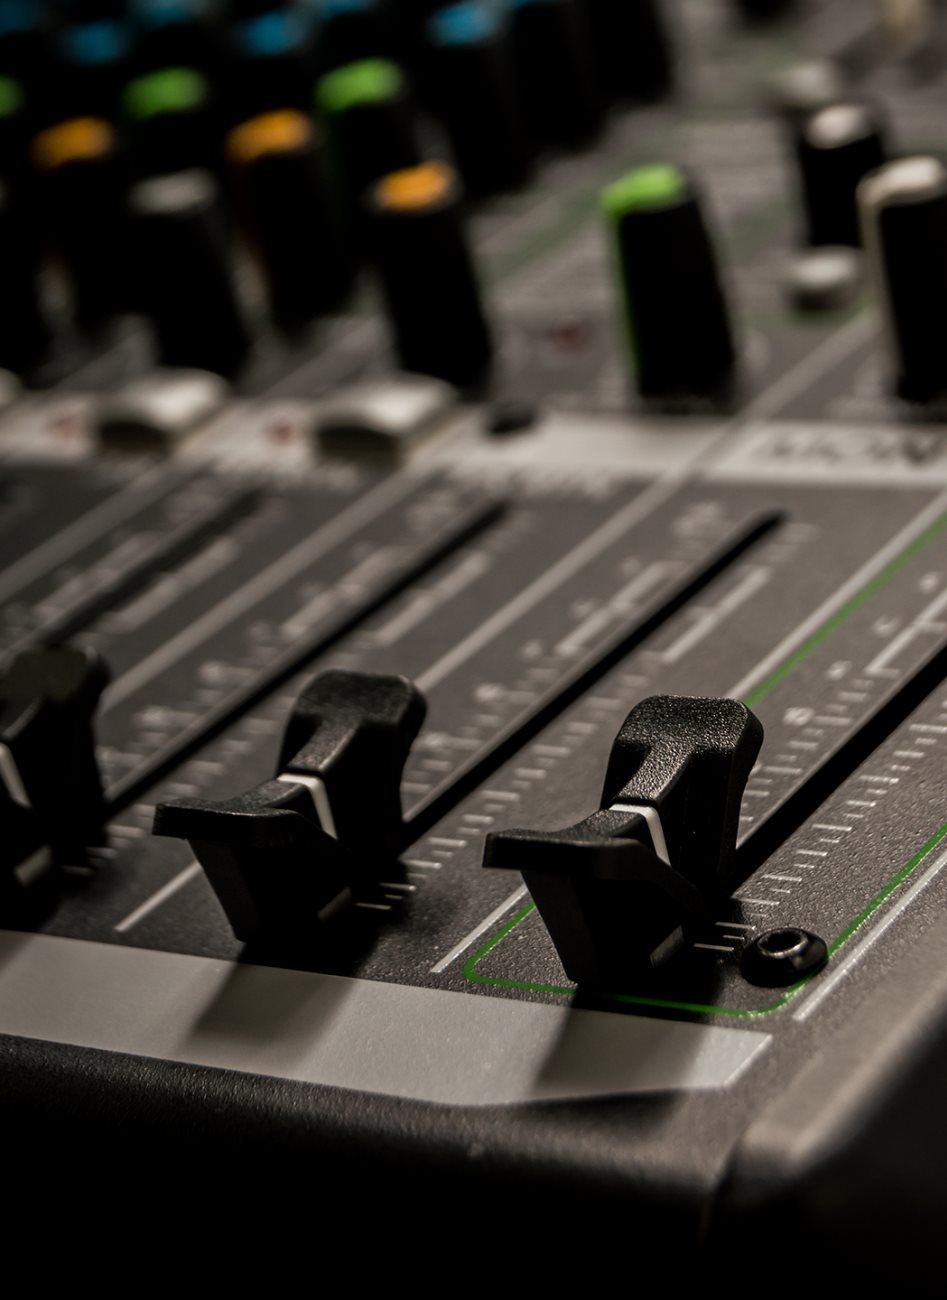 Mackie Profx8v2 8 Channel Mixer Profx8 V2 Show Picture 3